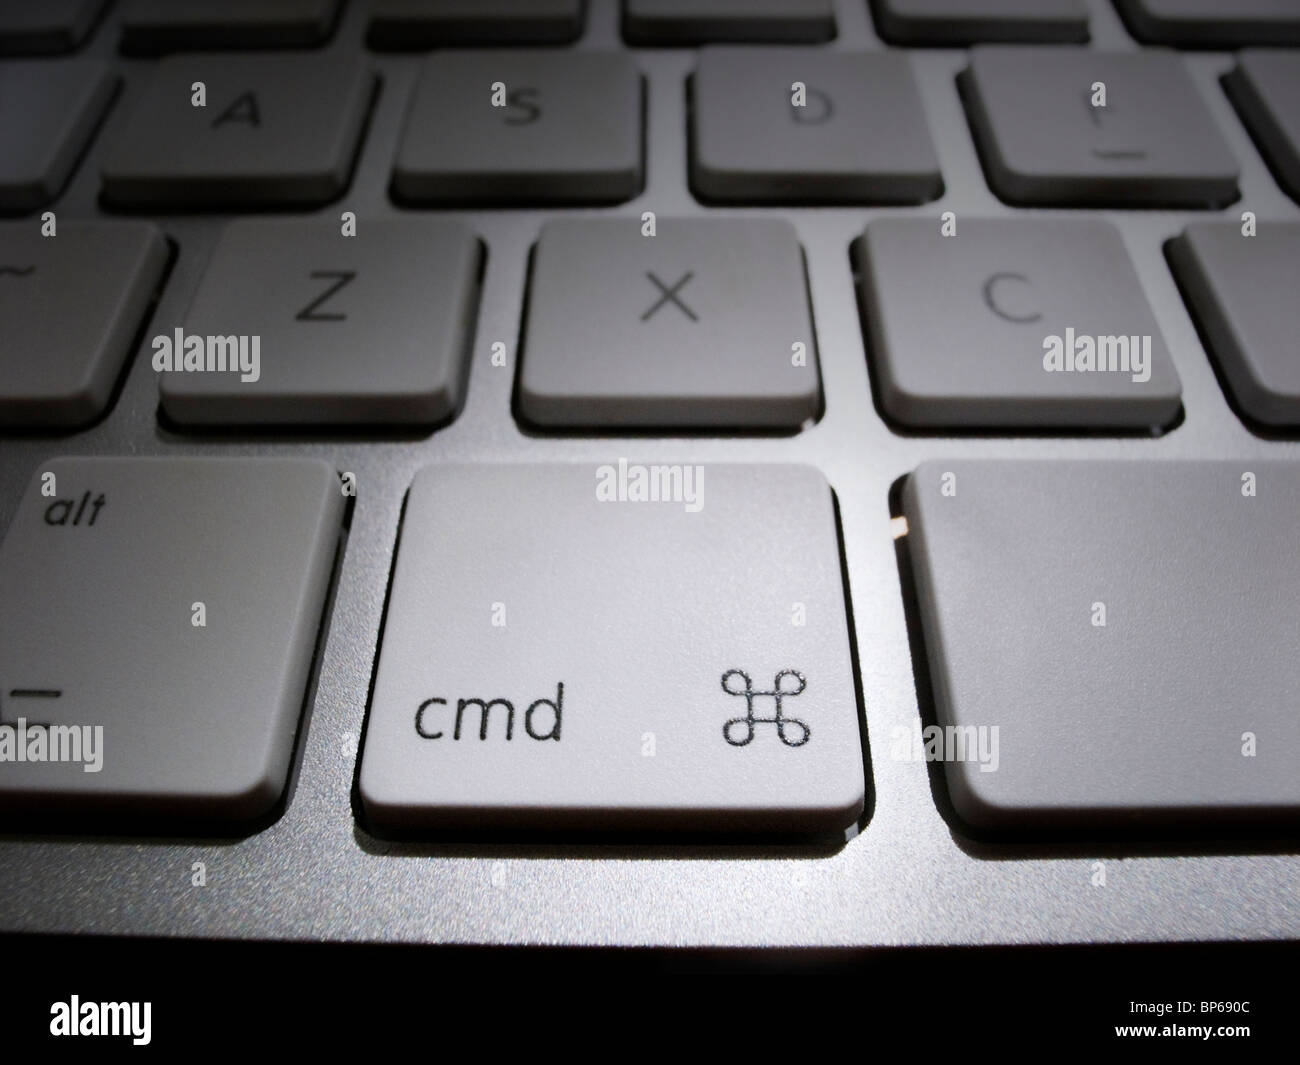 Close-up of Command Key on iMac keyboard Stock Photo: 30871580 - Alamy